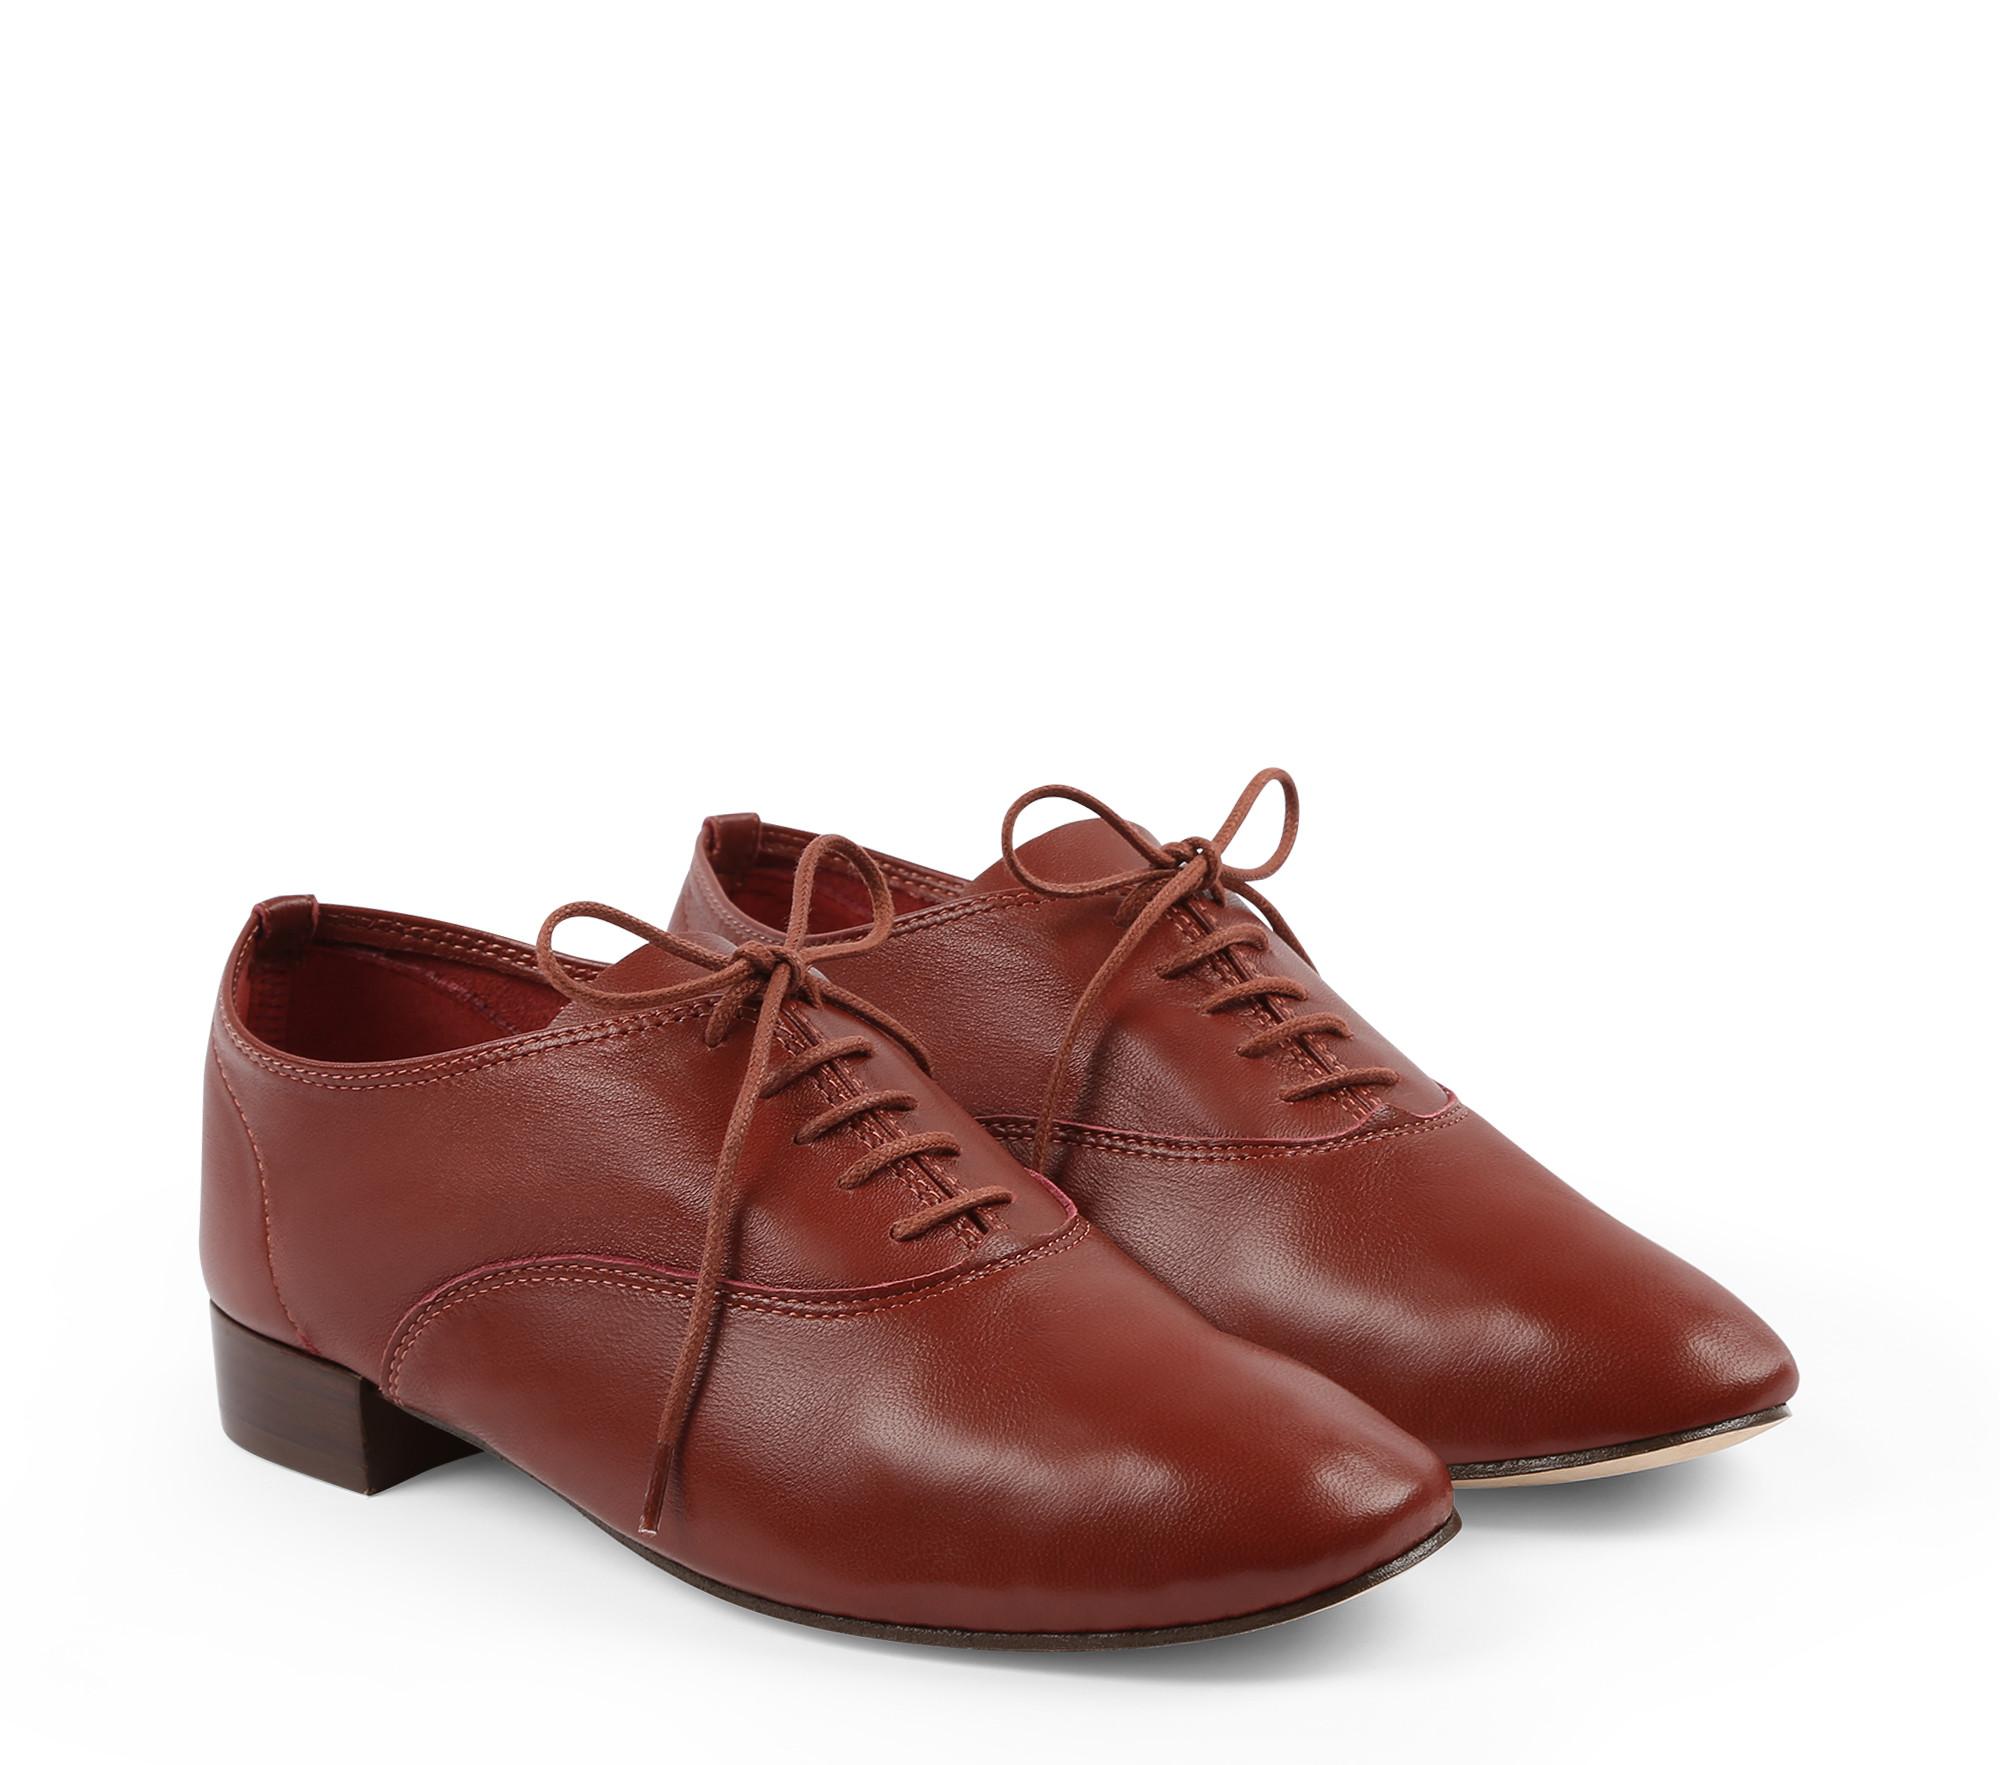 Zizi Oxford-Schuhe